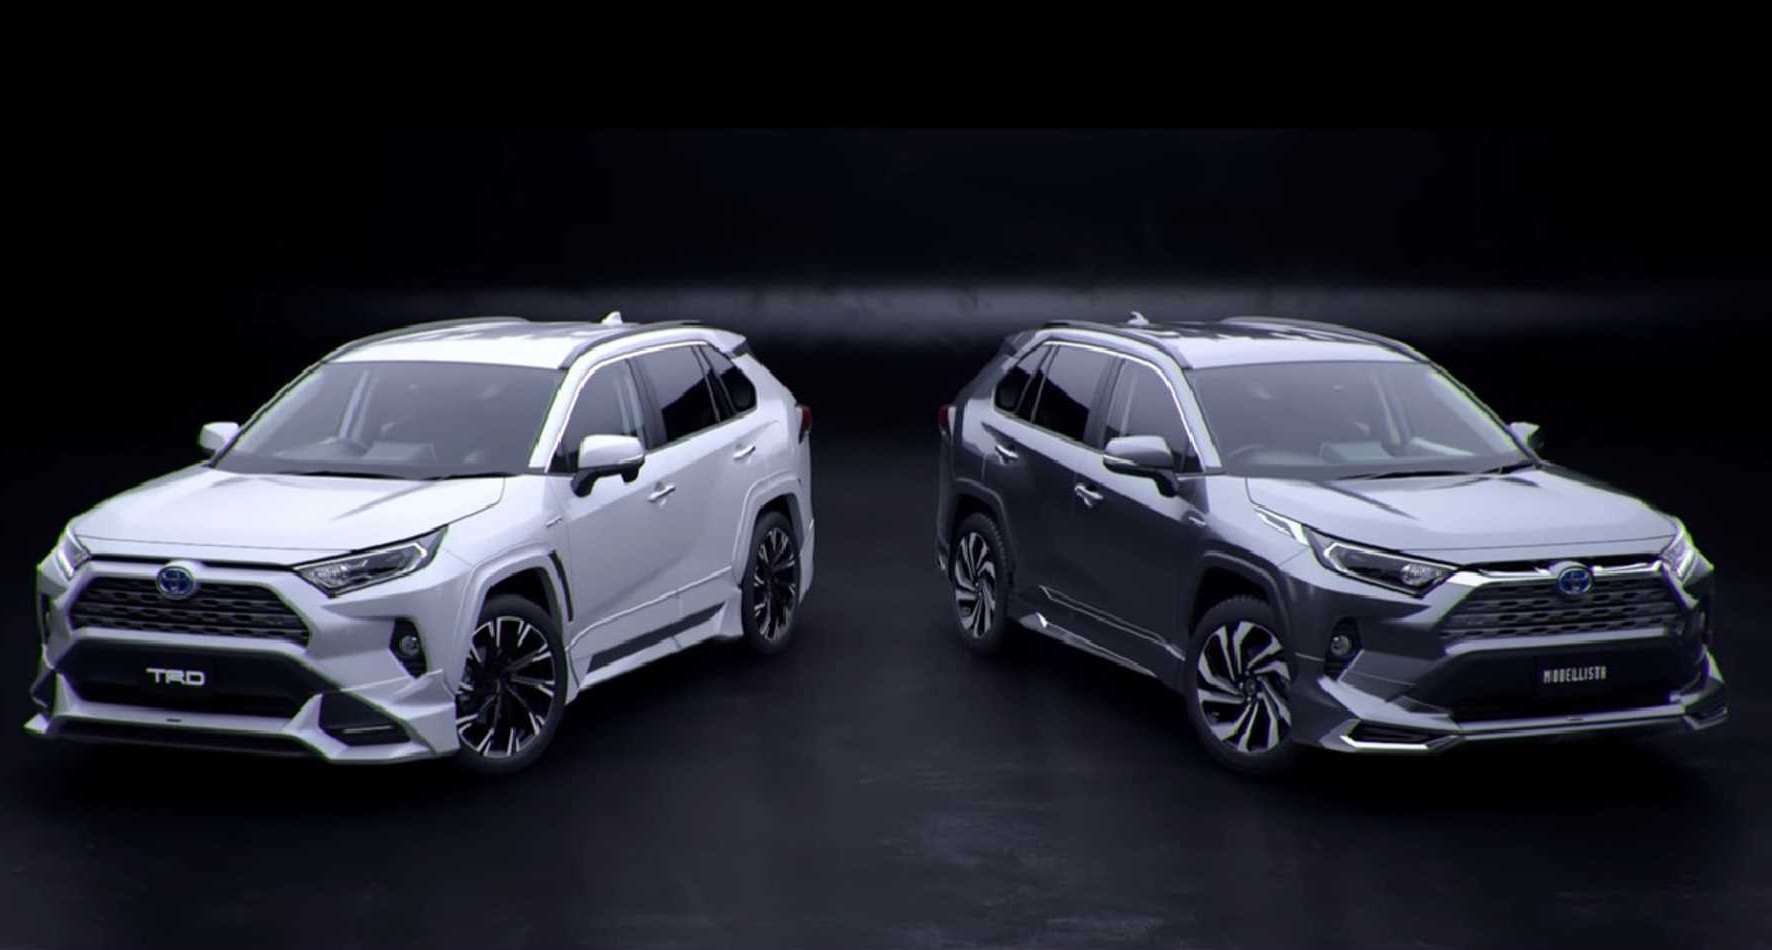 Яркий тюнинг Toyota RAV4 2019 от TRD и Modellista